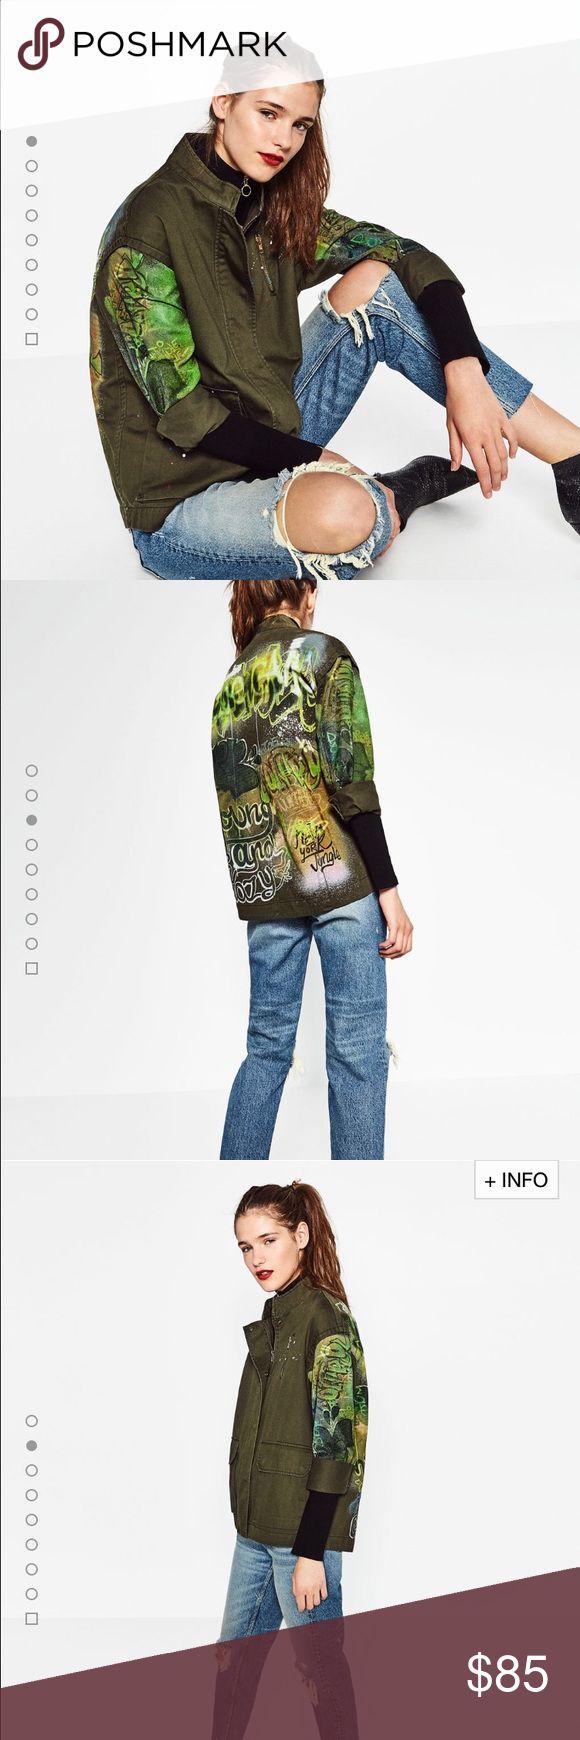 Zara Graffiti Parka, brand new  Woman collection, one of the best parkas Zara Jackets & Coats